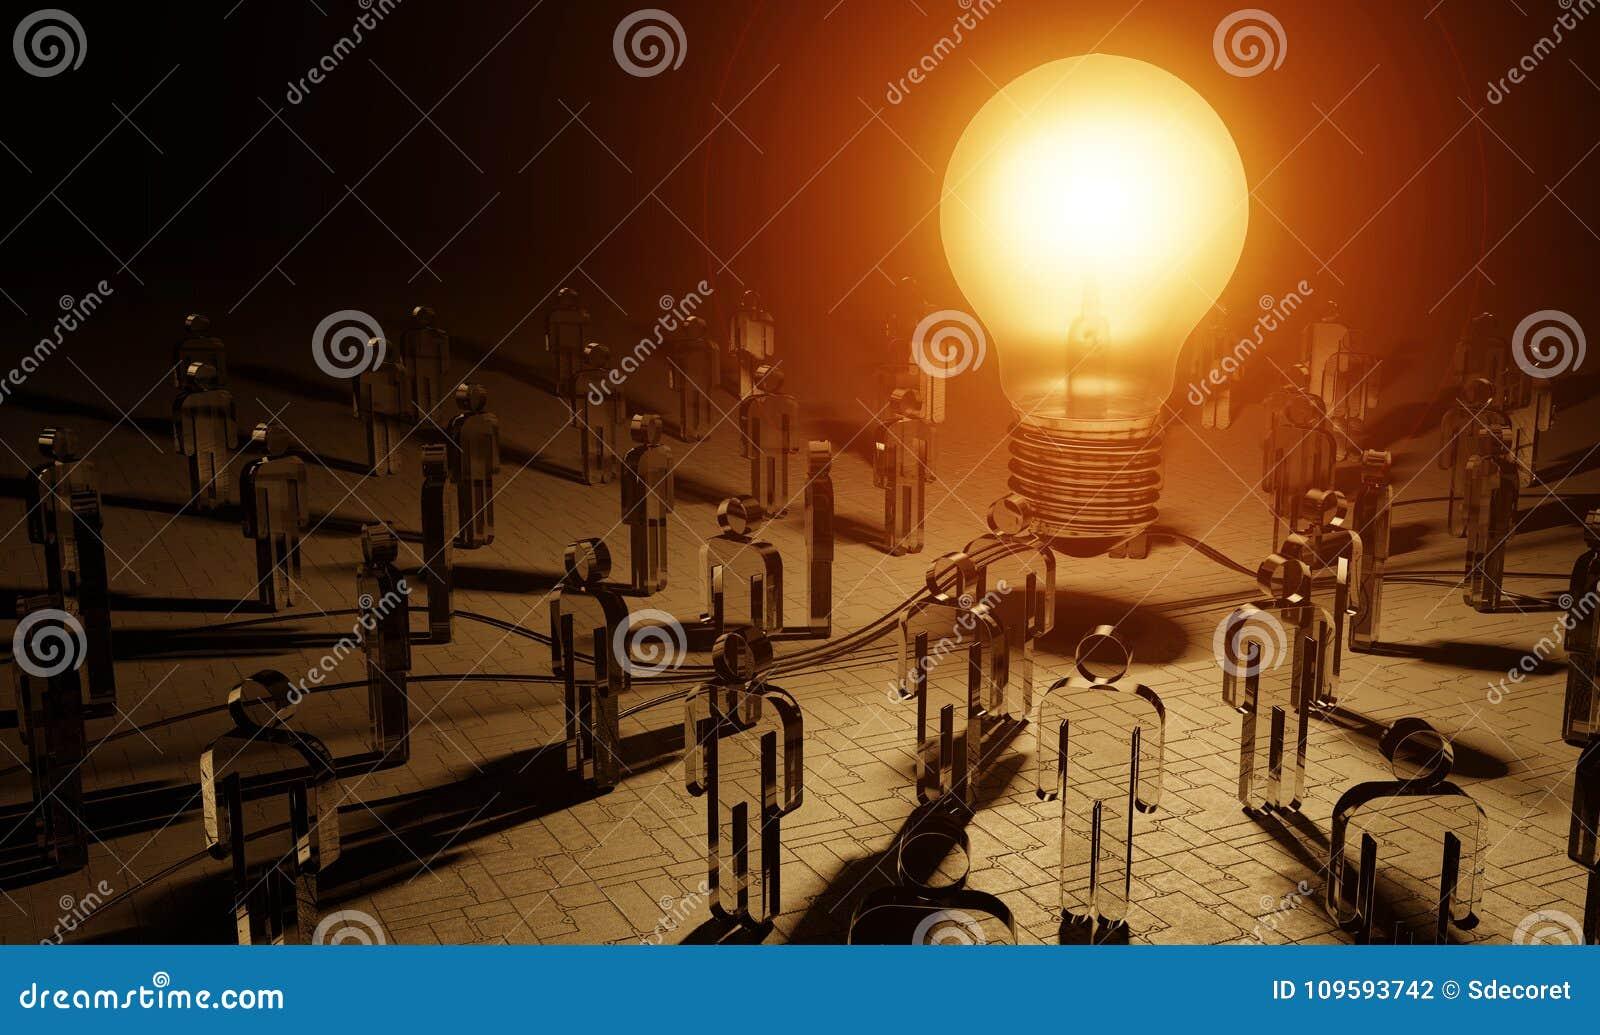 Big lightbulb illuminating a group of people 3D rendering